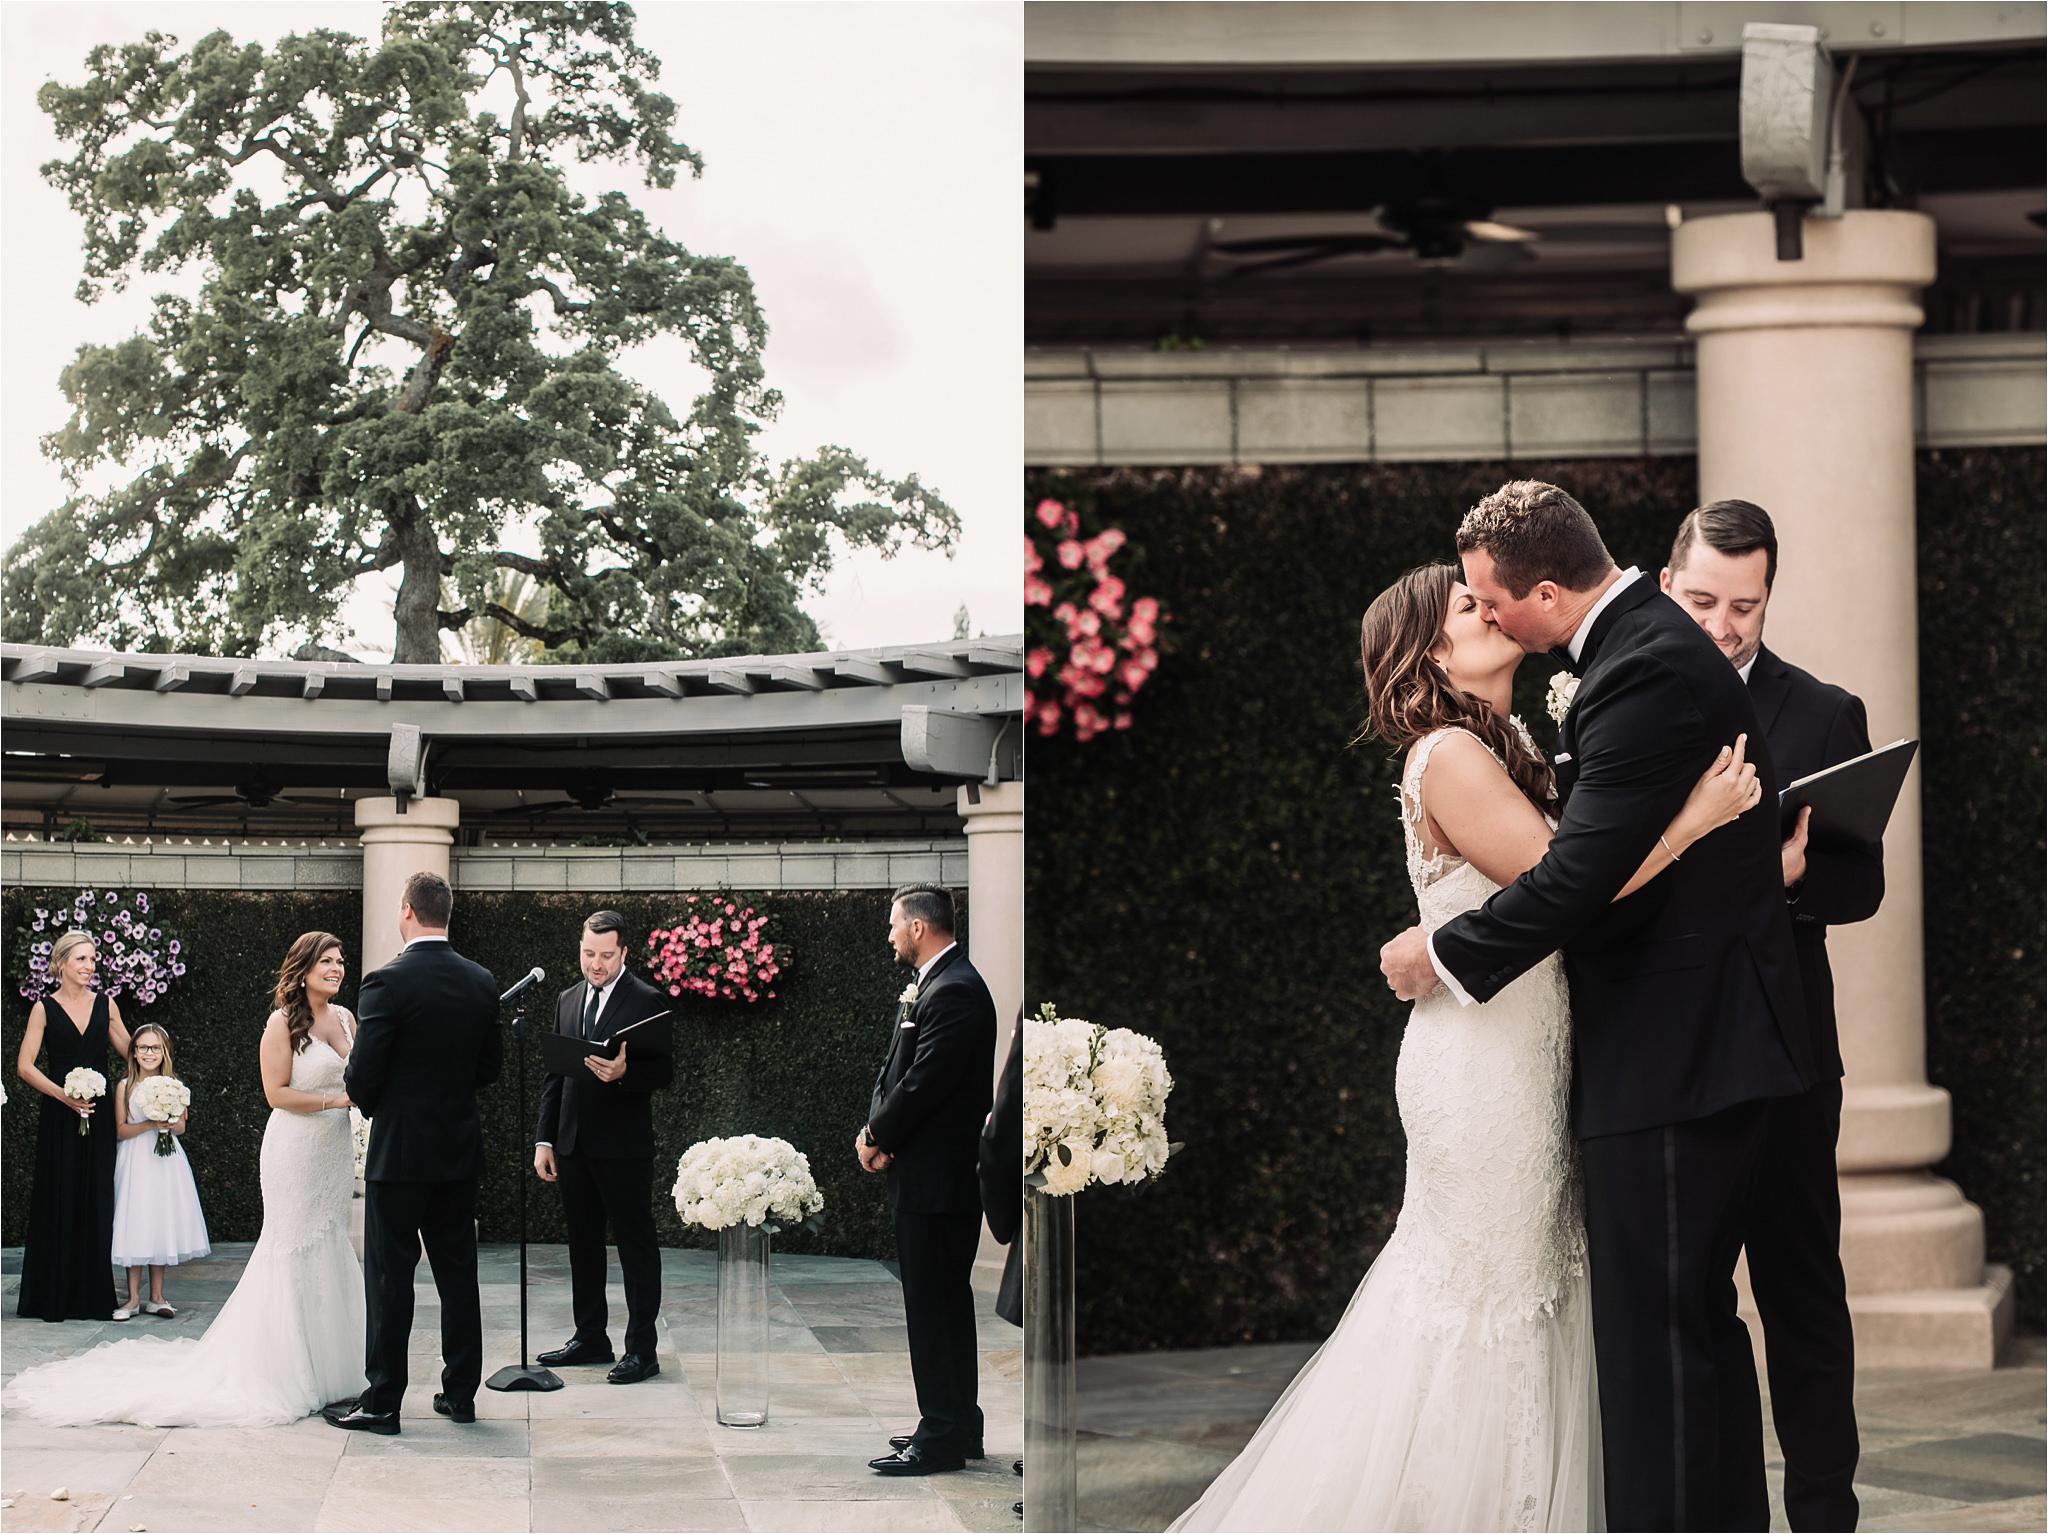 jessica-roman-photography-arden hills wedding photograpger-sacramento-boise-27.jpg